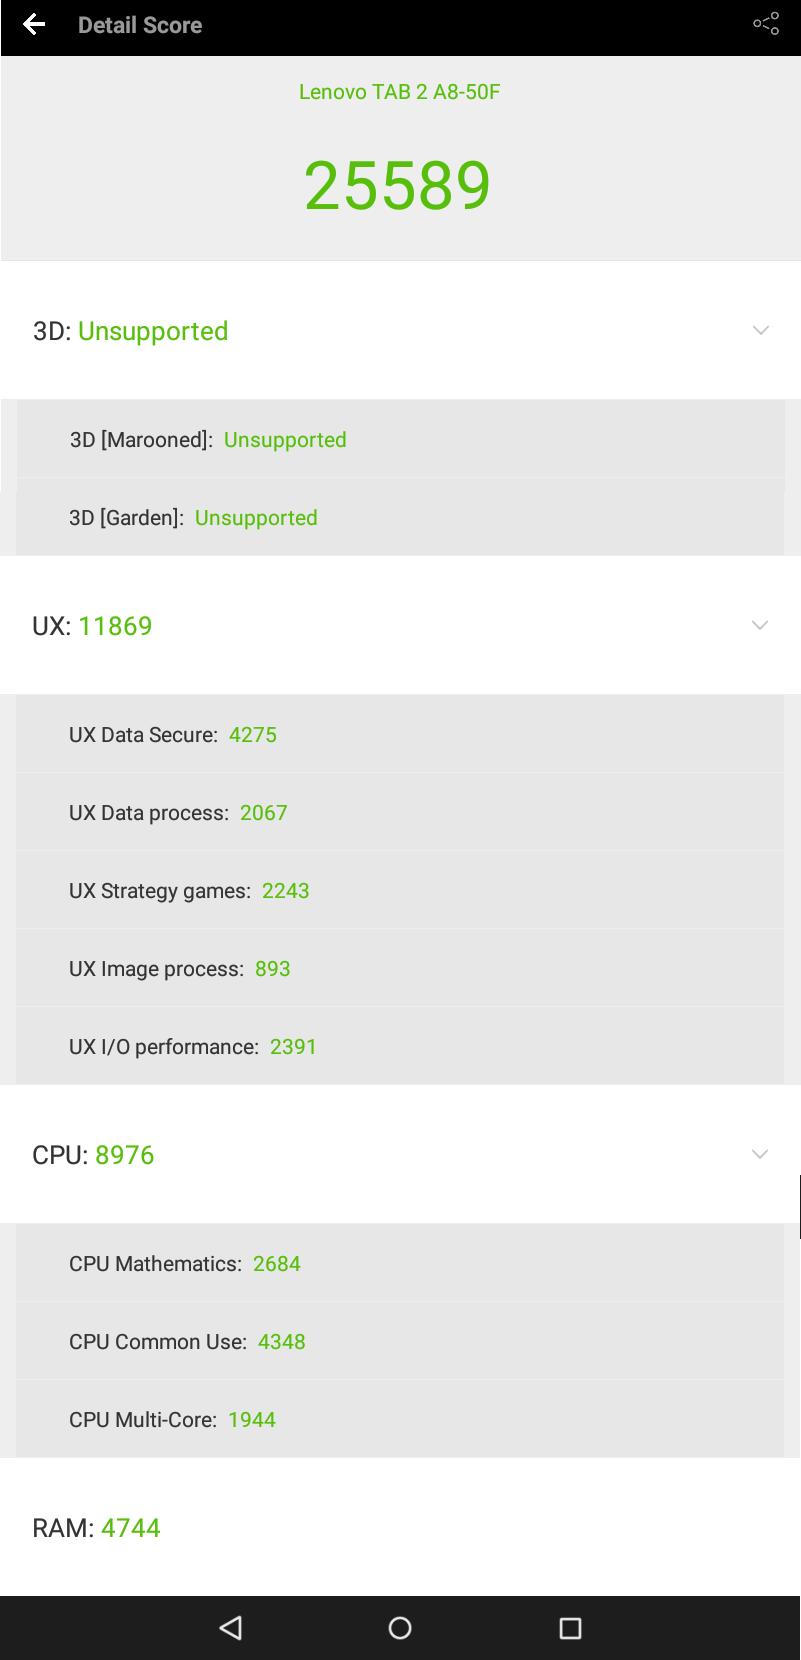 Lenovo TAB 2 A8-50F AnTuTu Benchmark 6.1.4 Details